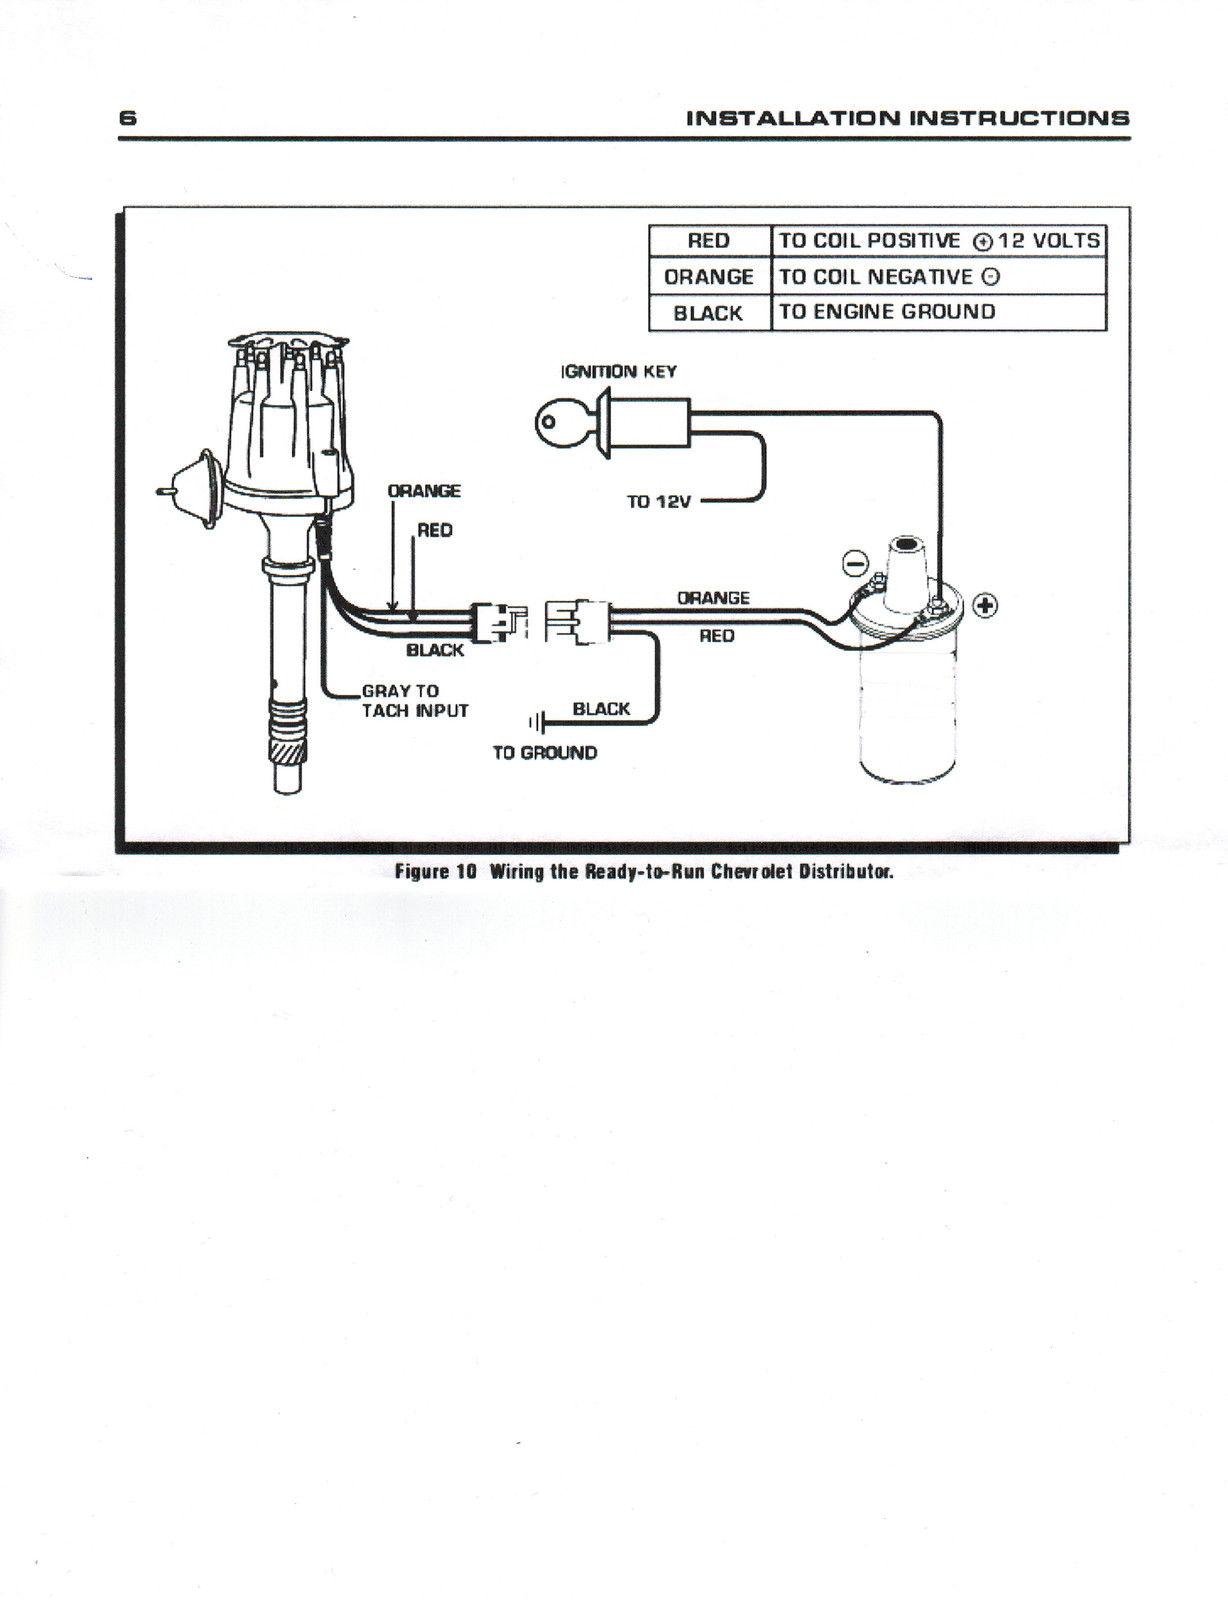 Accel Hei Distributor Wiring Diagram